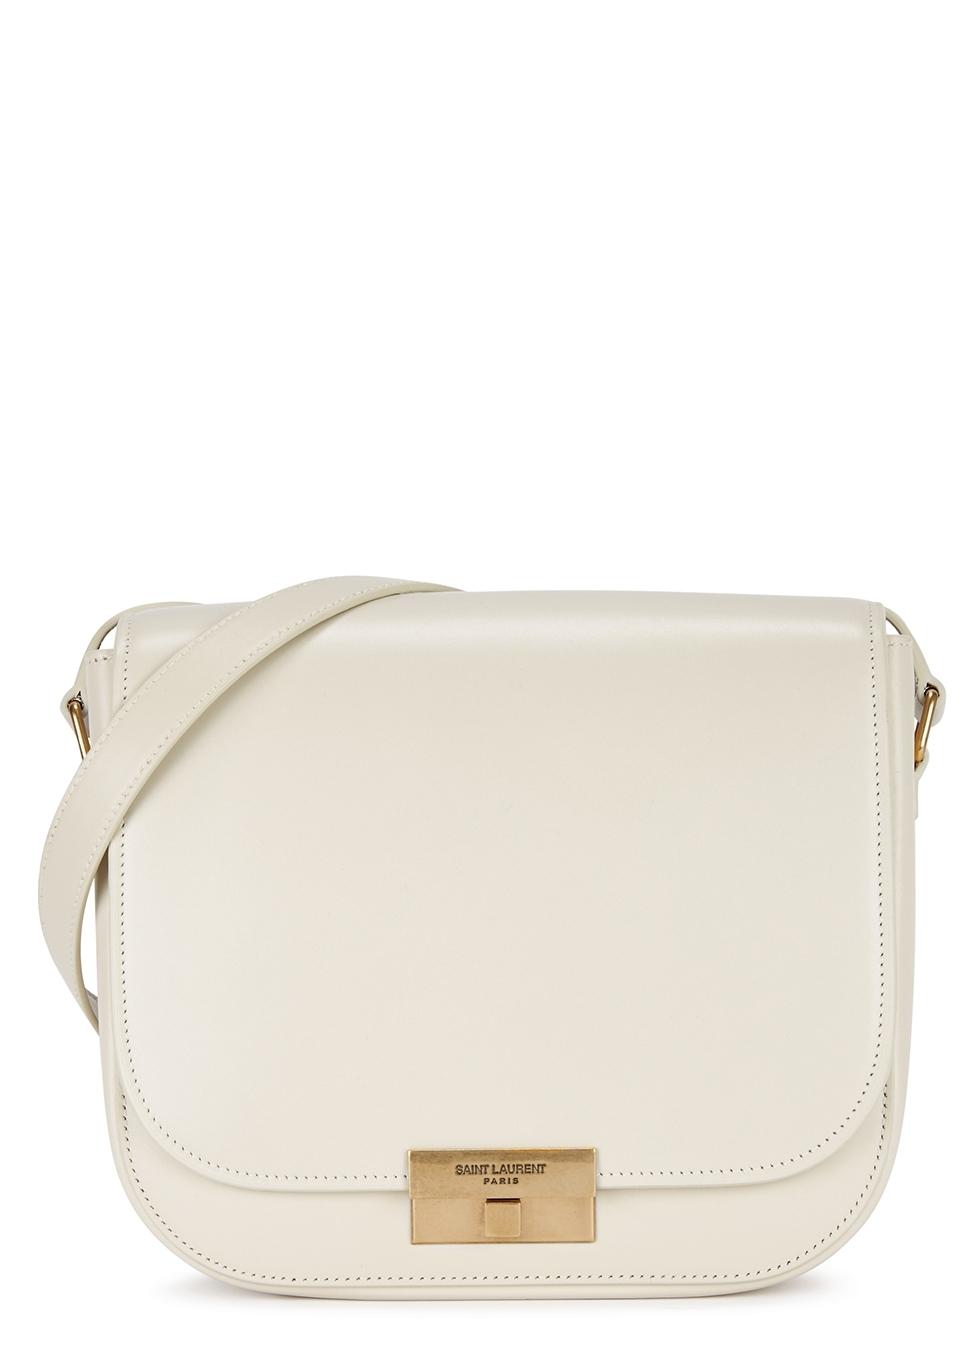 9ebc9b8659 Women s Designer Bags